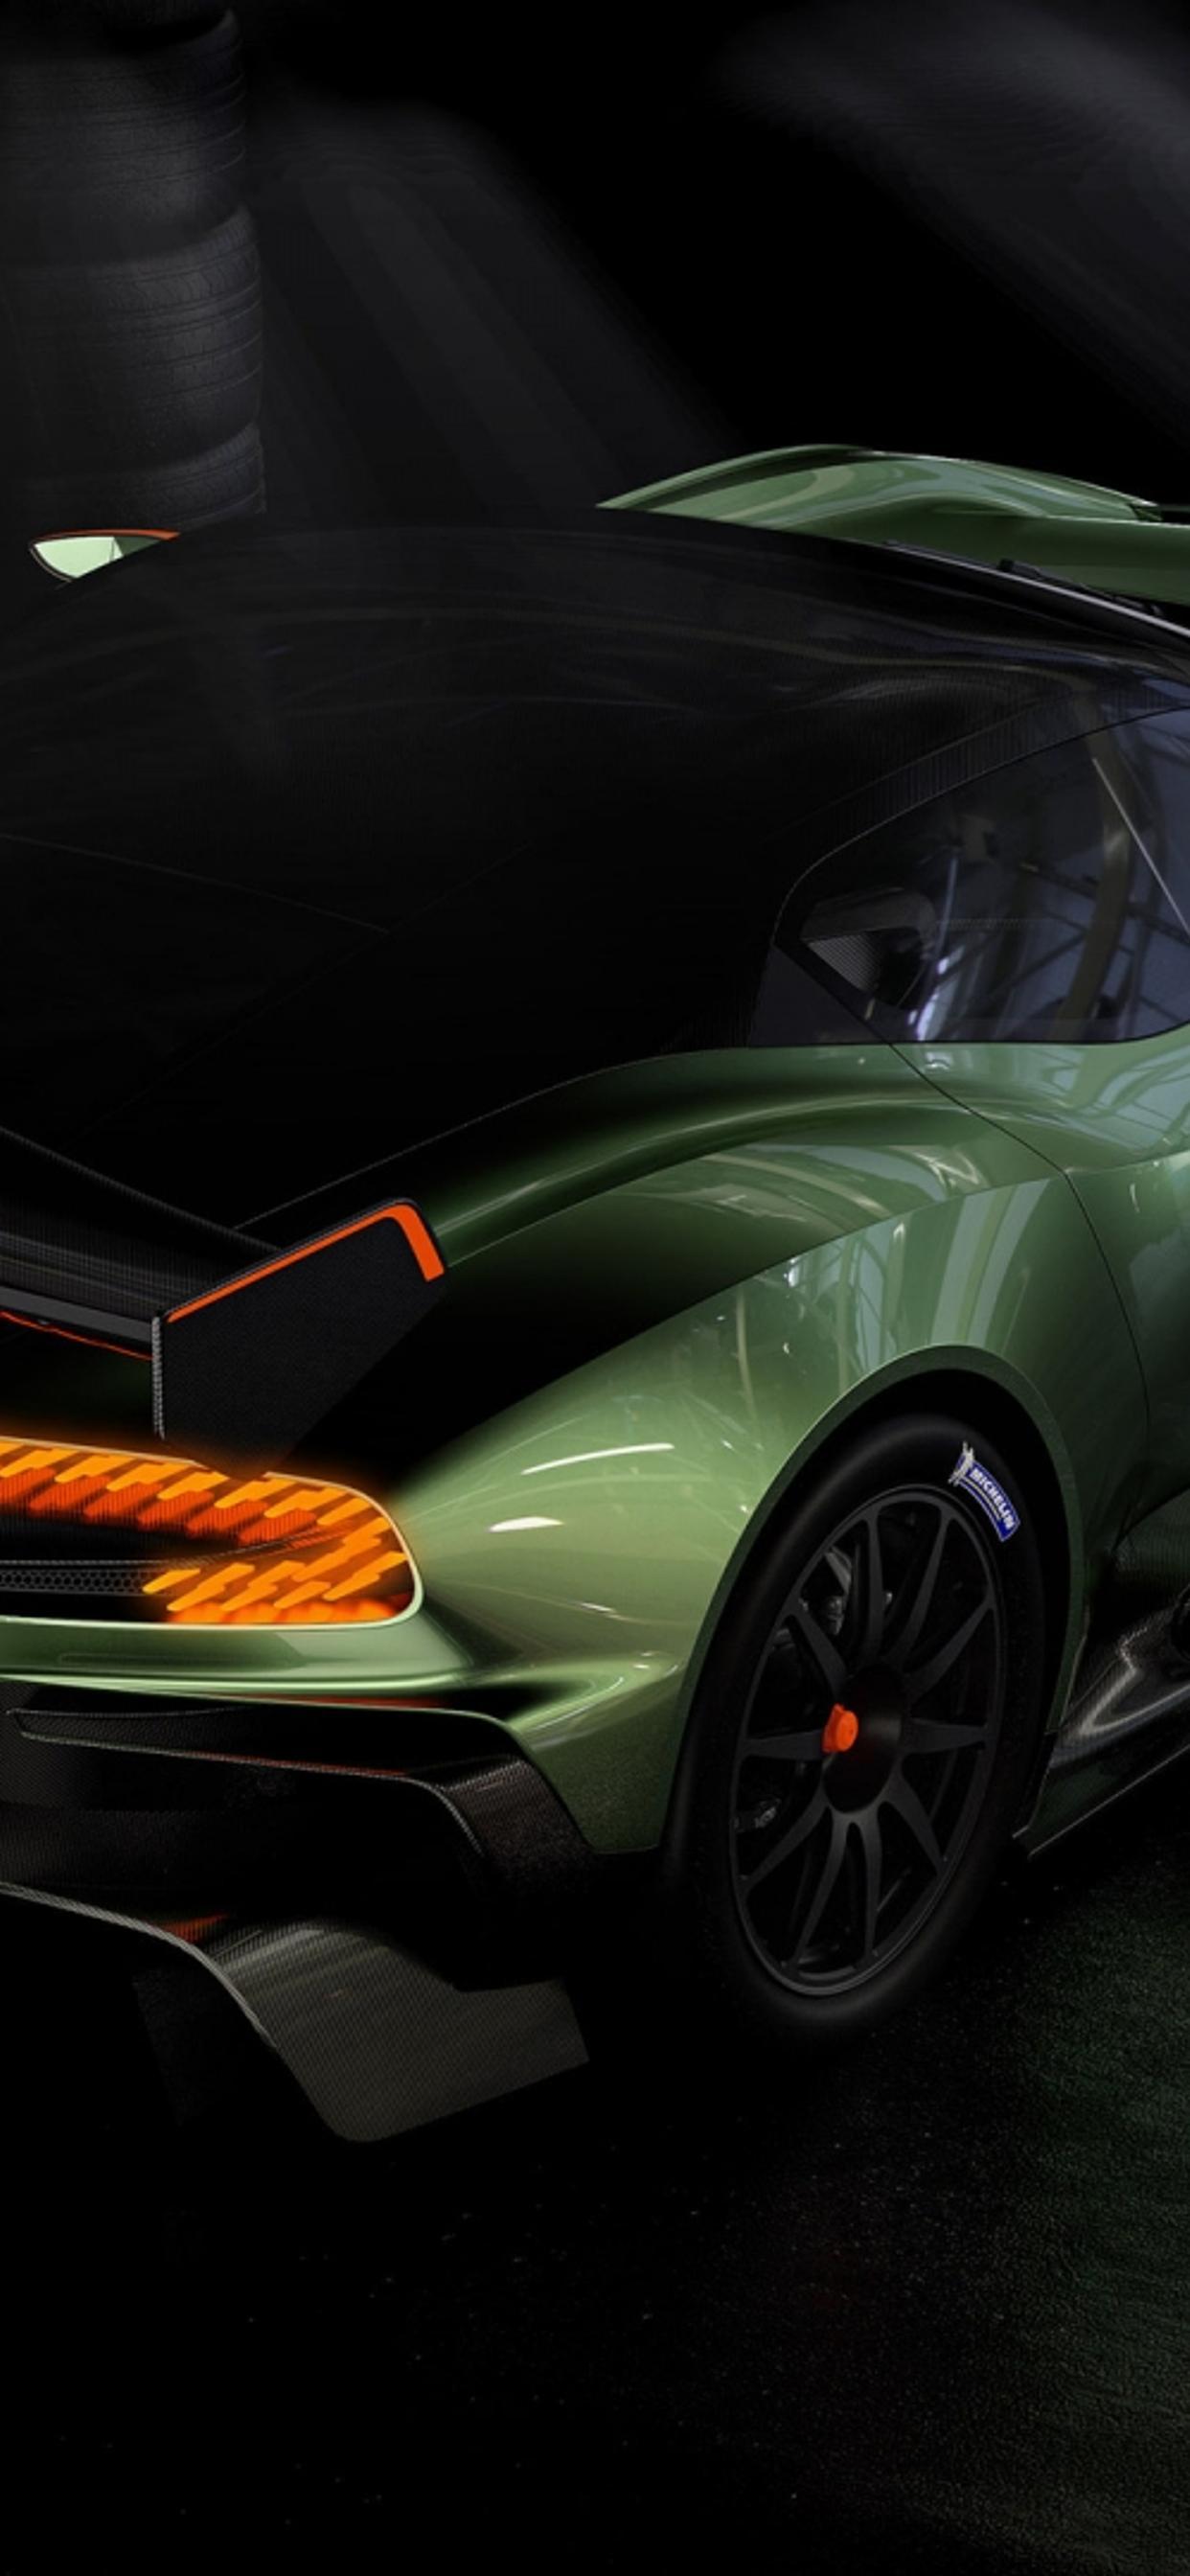 Green Aston Martin Vulcan Top Sport Car